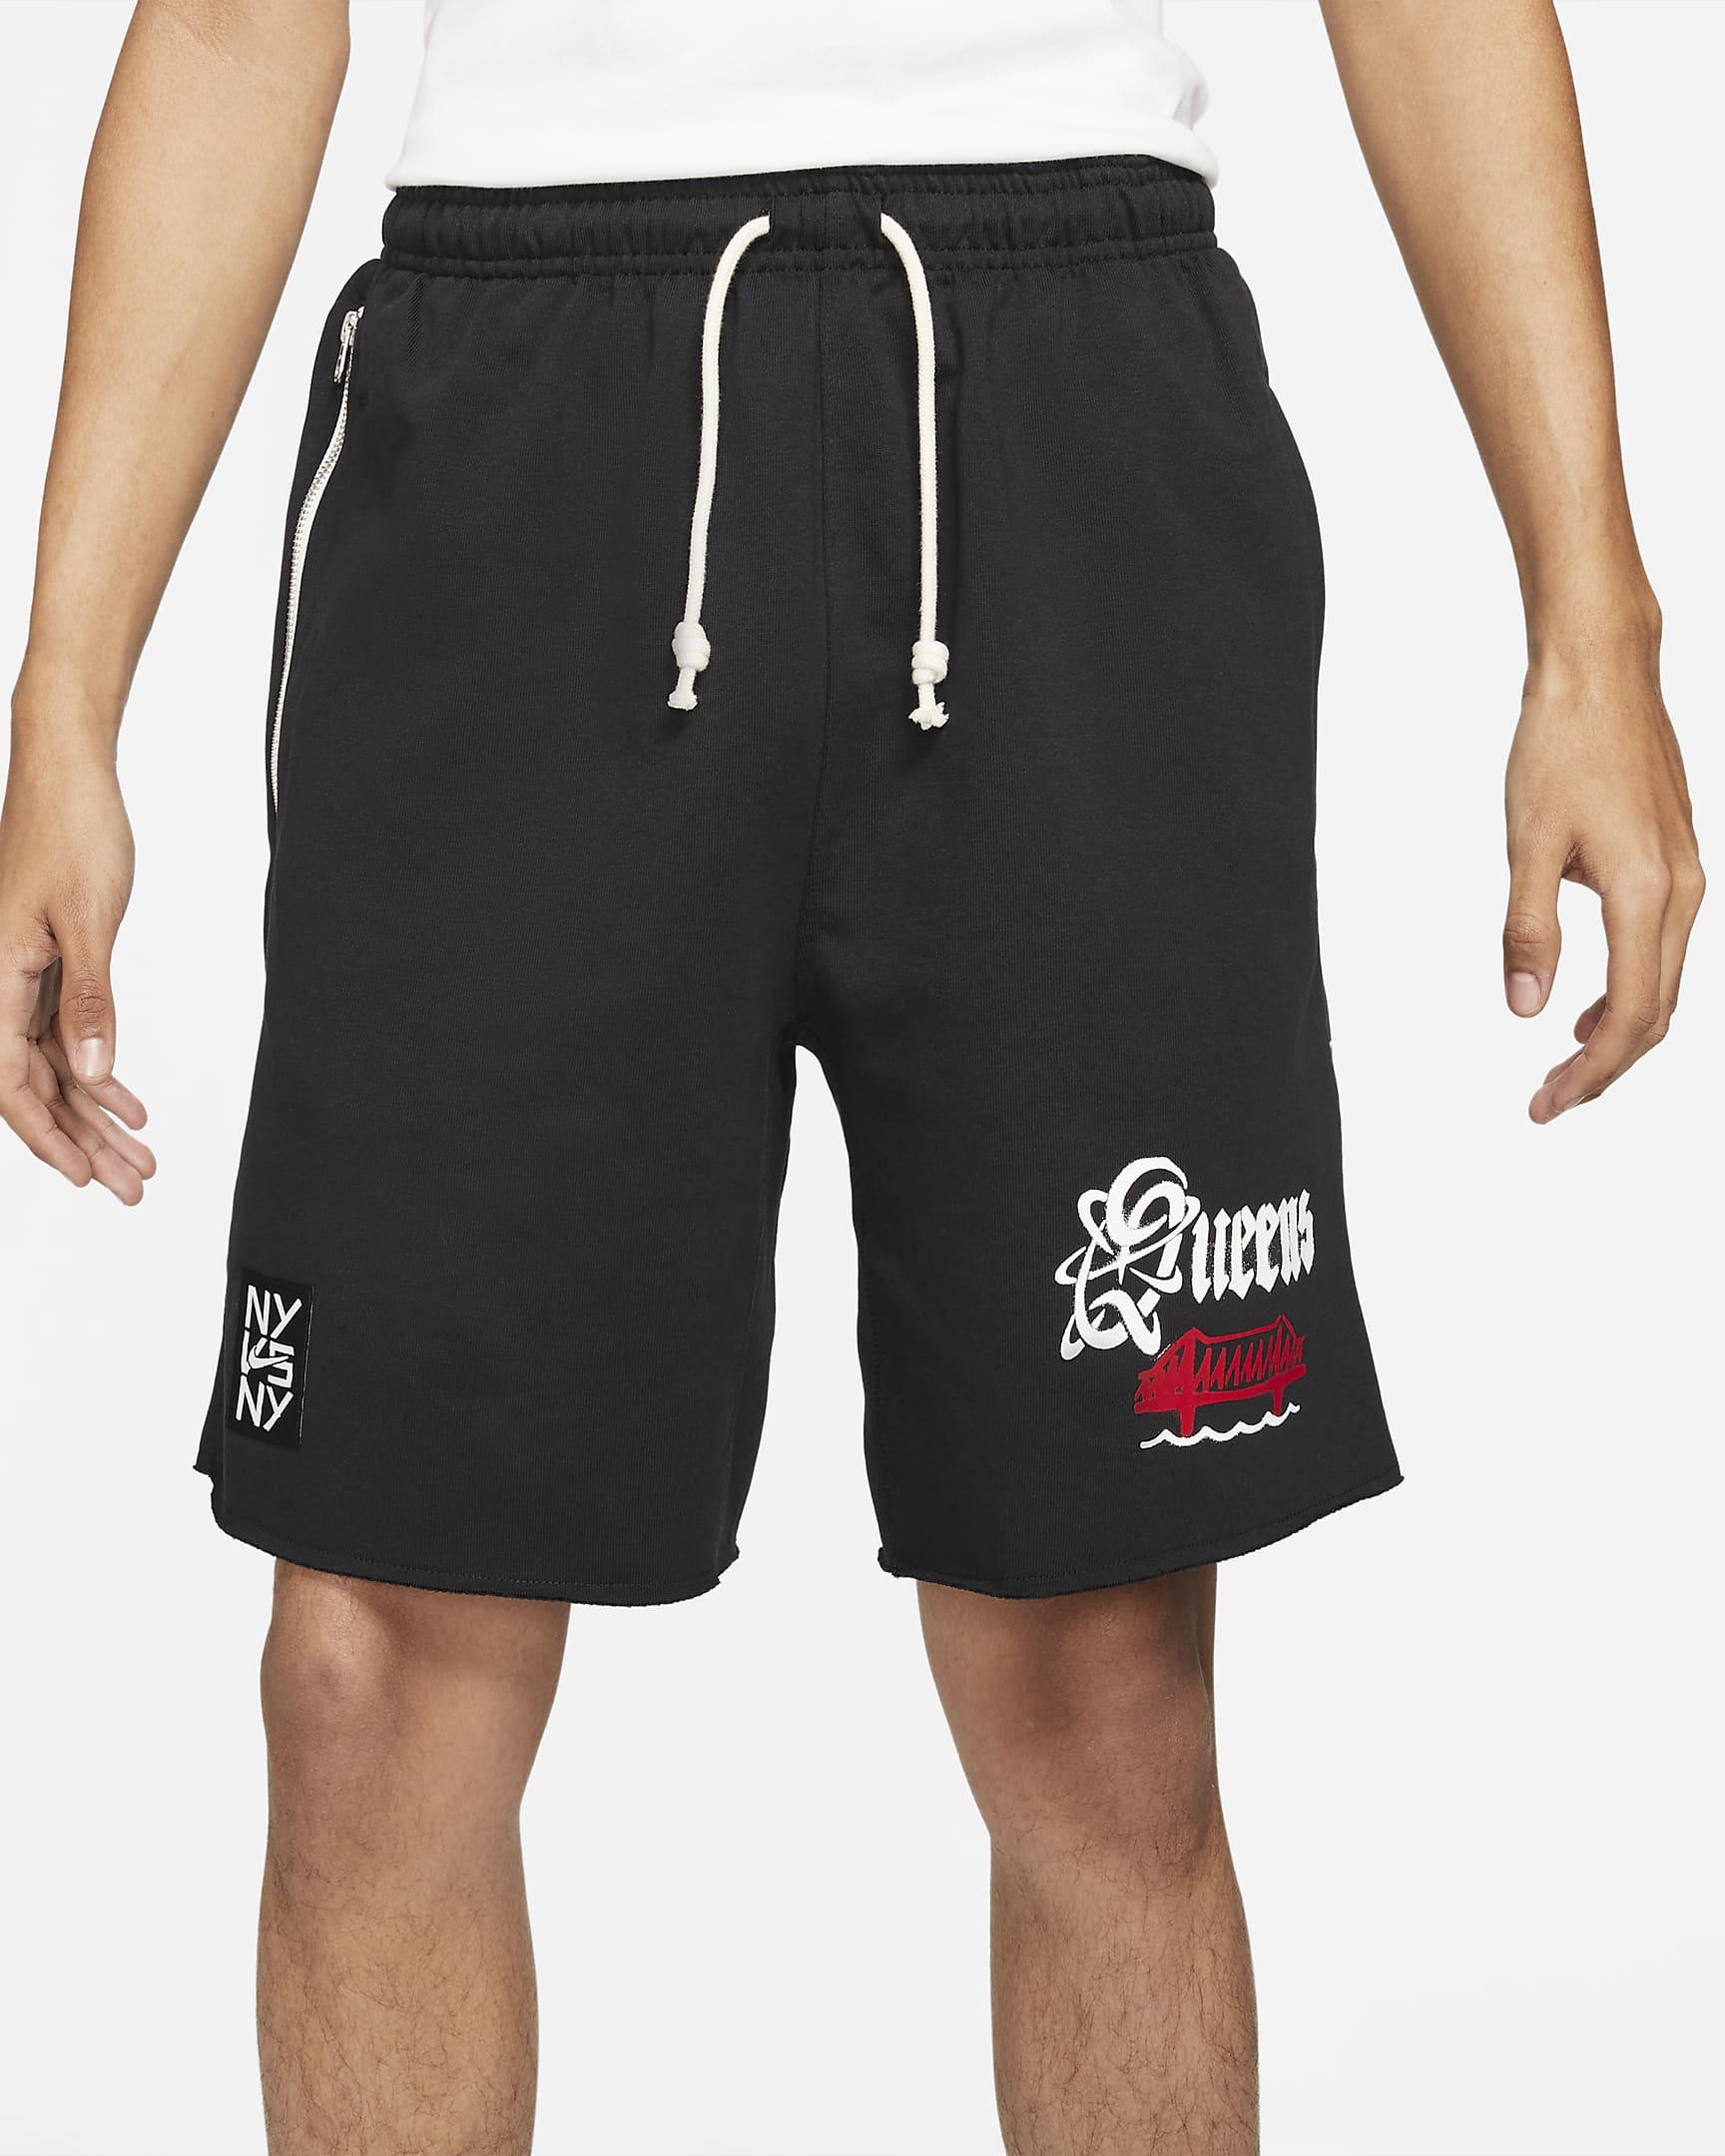 standard-issue-lincoln-park-mens-basketball-fleece-shorts-Wjf9fz.png